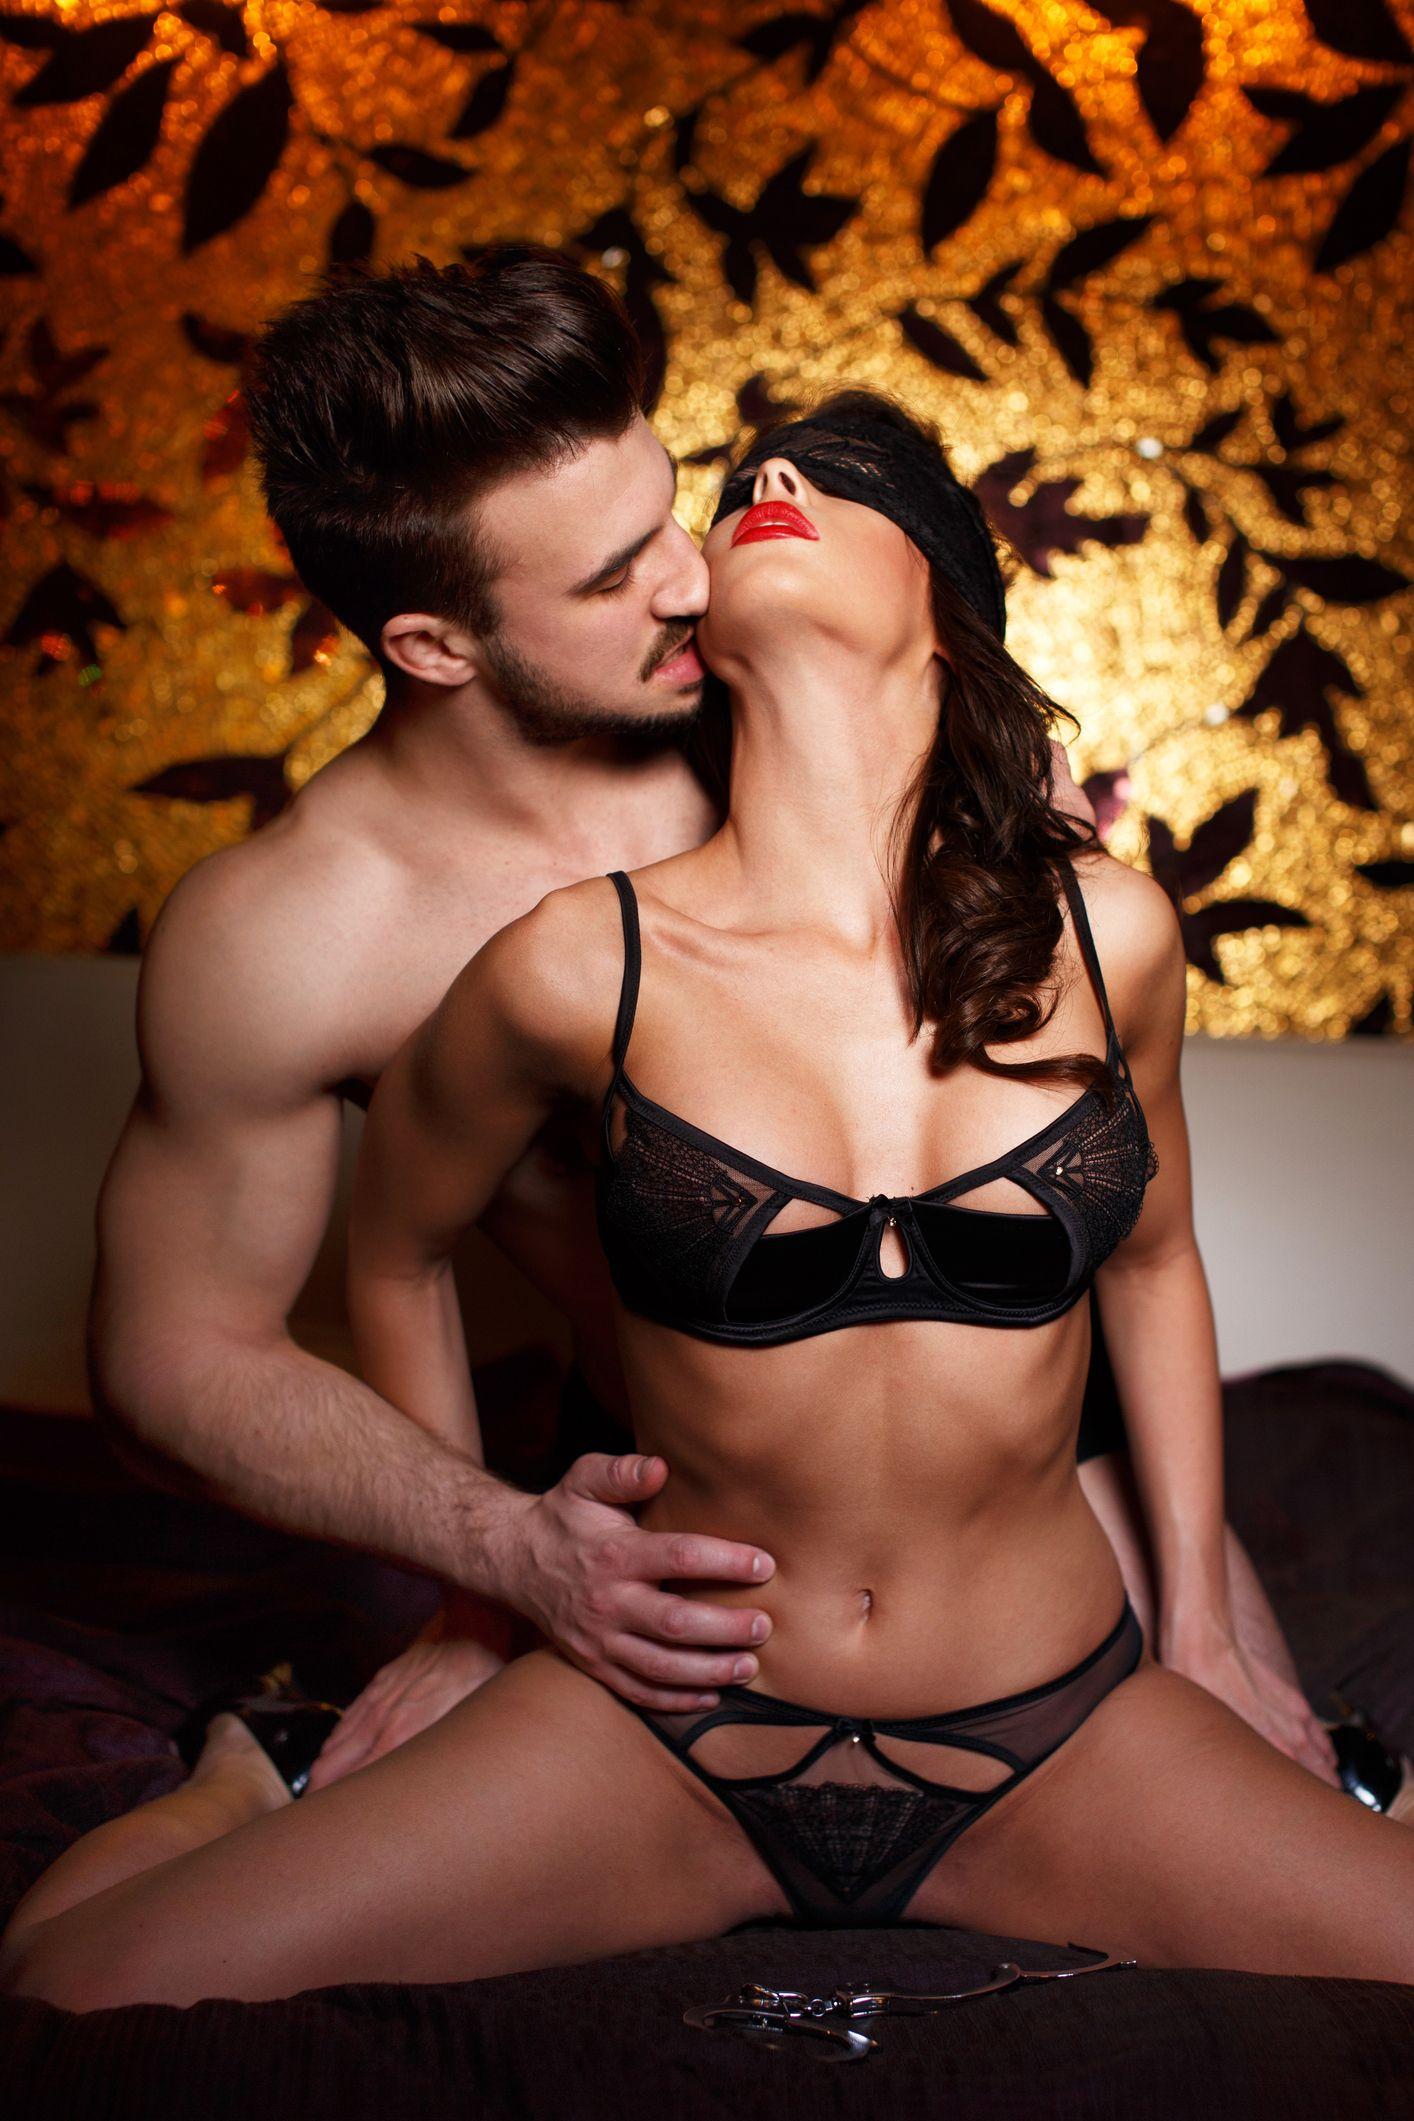 Couples Sex Pics